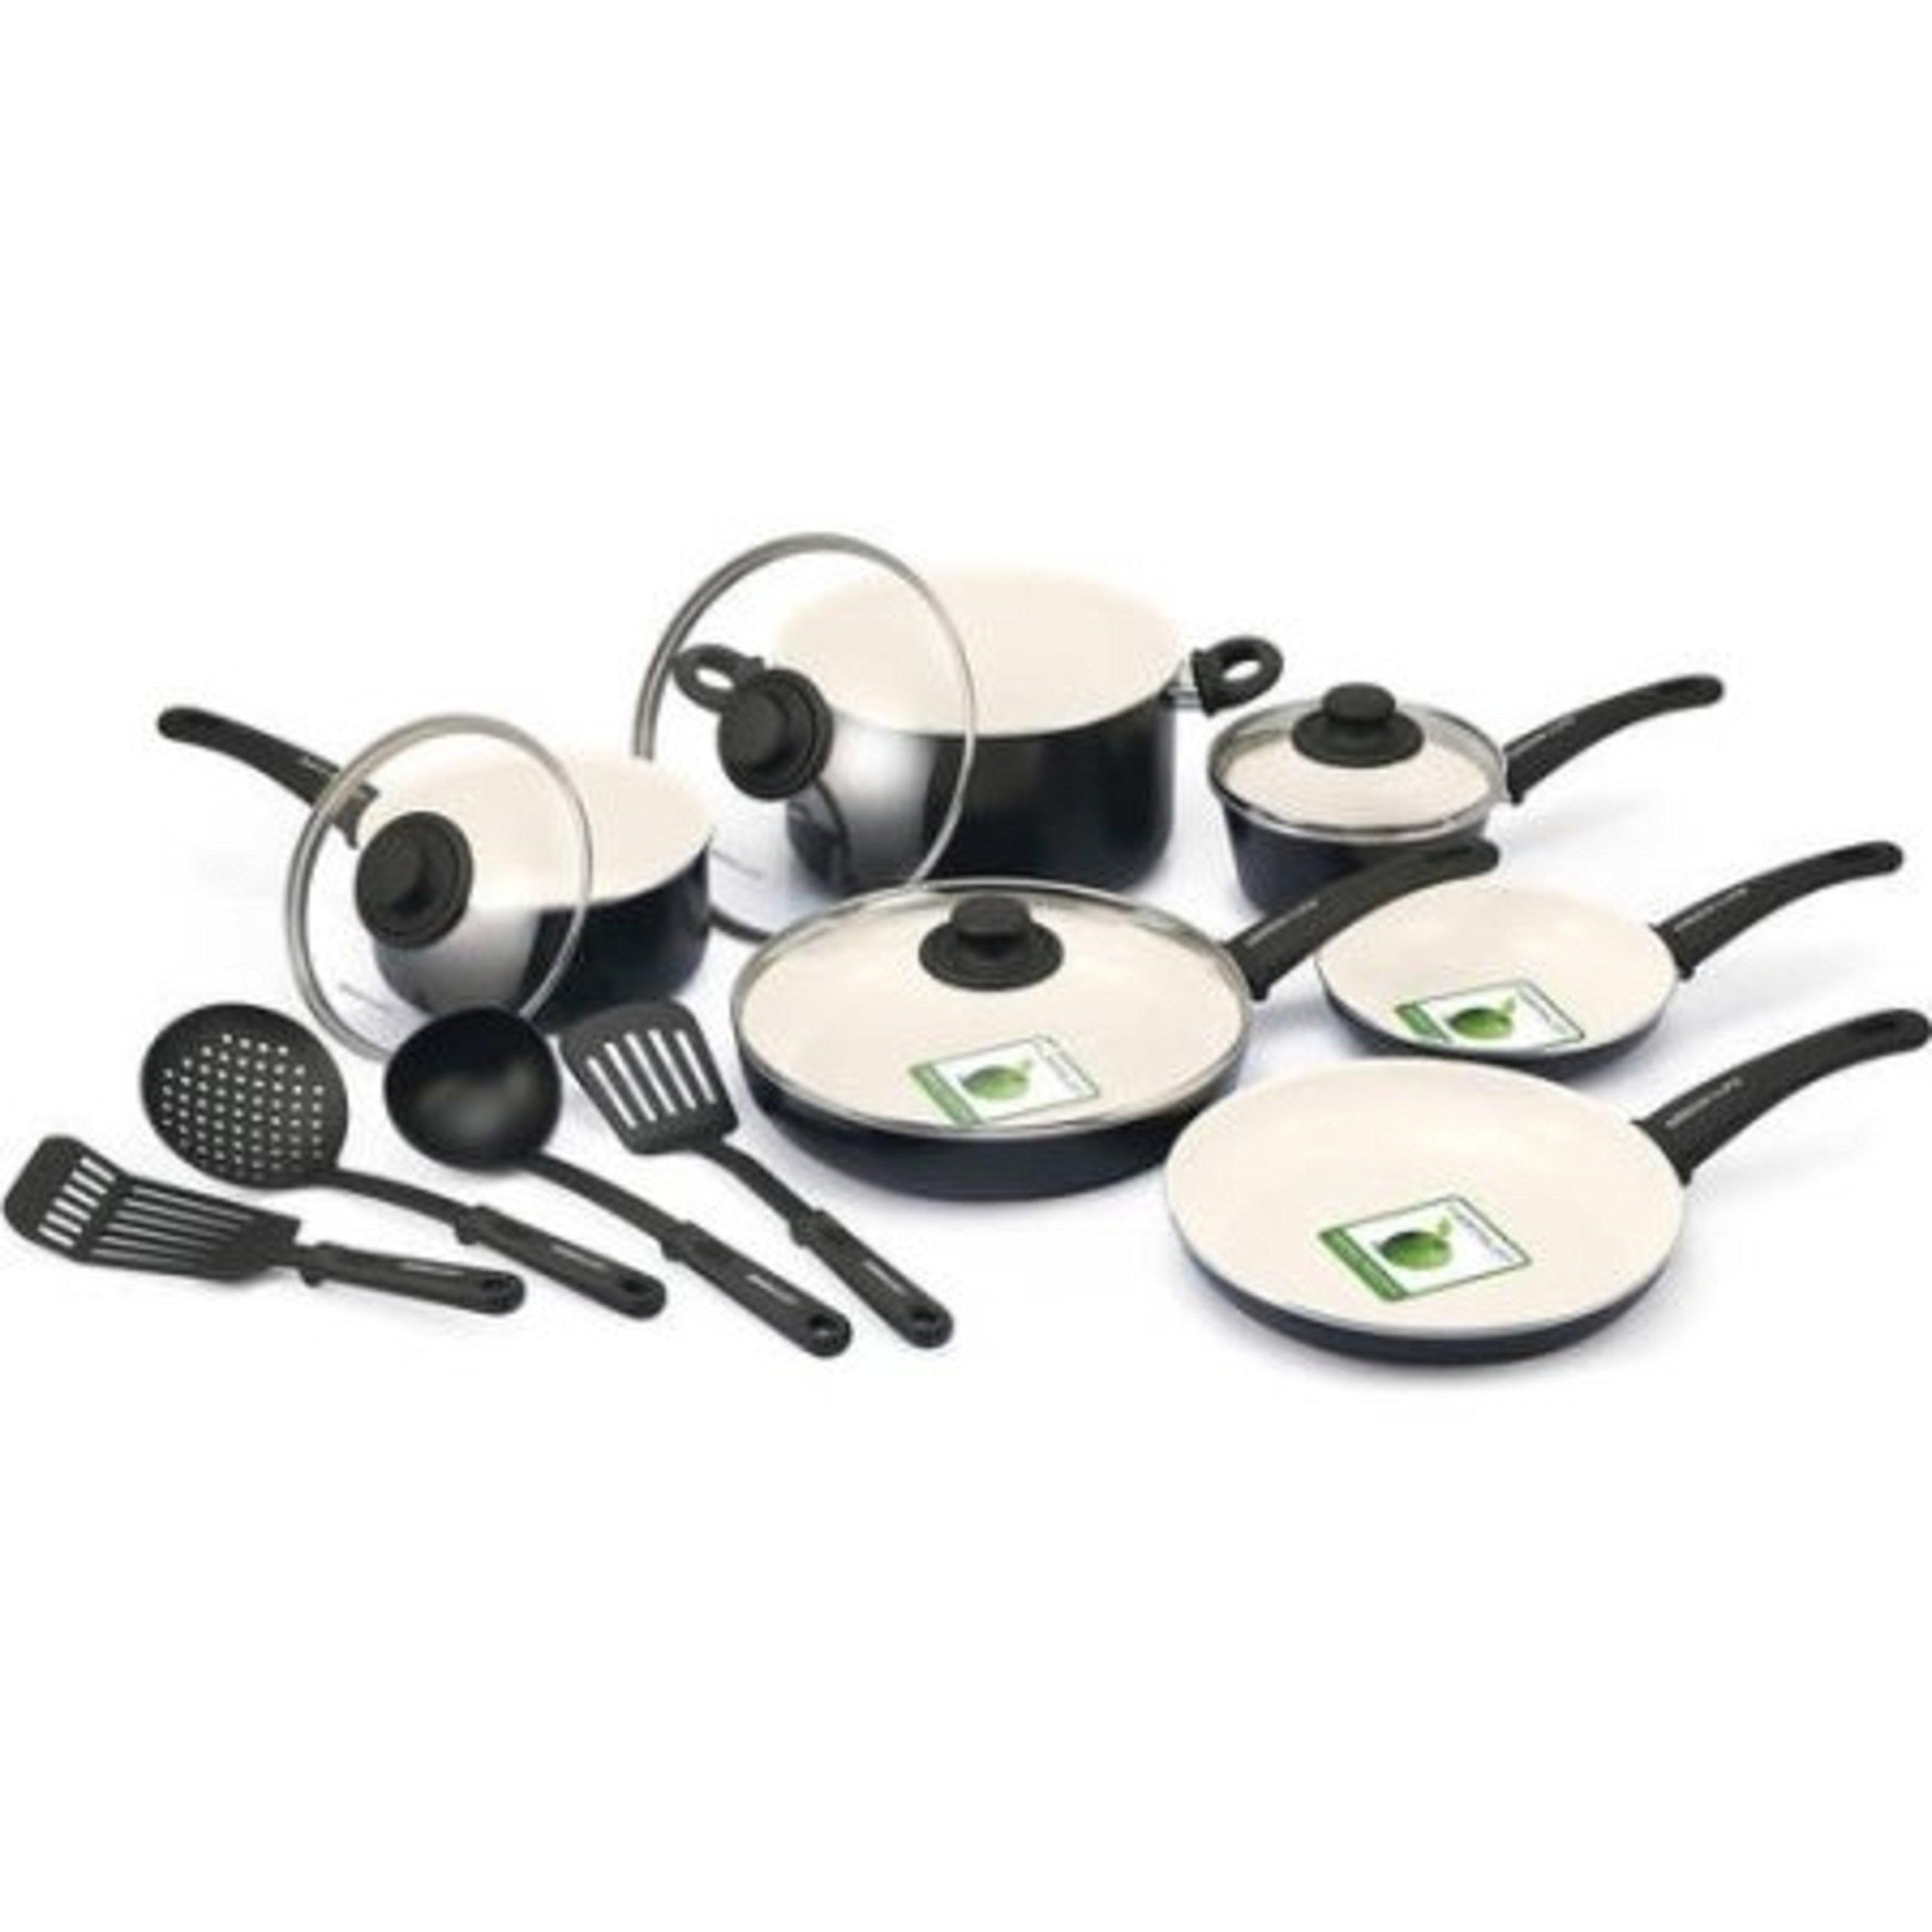 14-Piece Black Ceramic Thermolon Non-Stick Ergonomic Handles Cookware Set